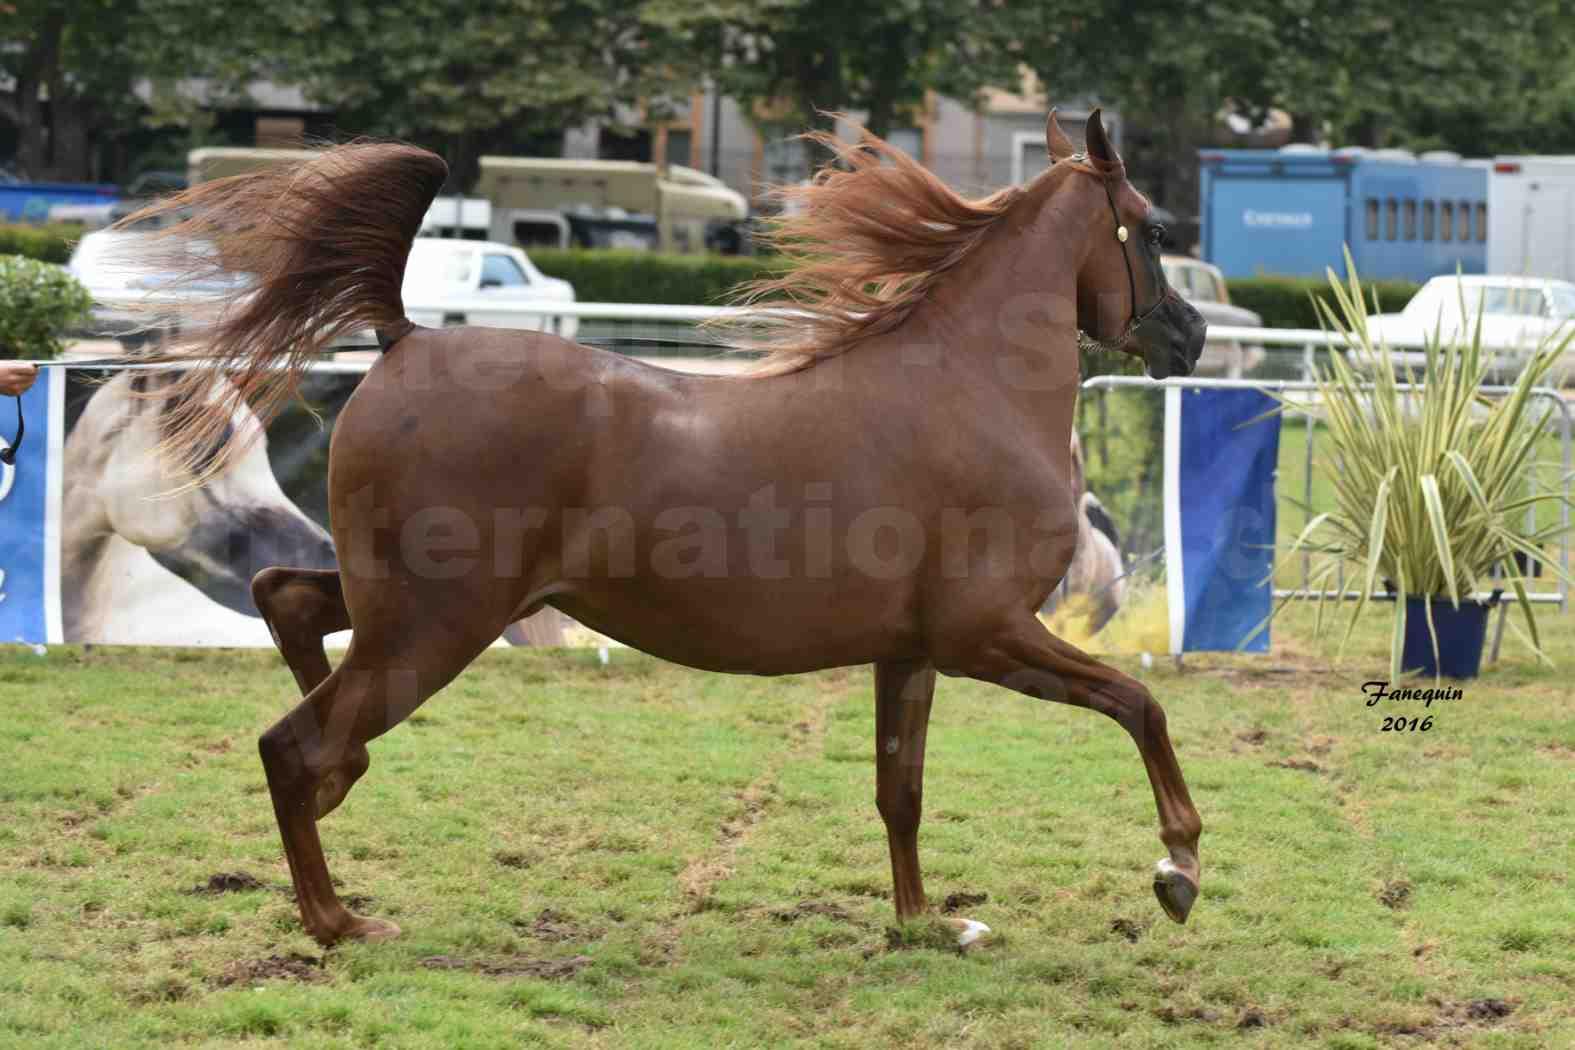 International Arabian Horse Show B de VICHY 2016 - PEARL DE DJOON - Notre Sélection - 38